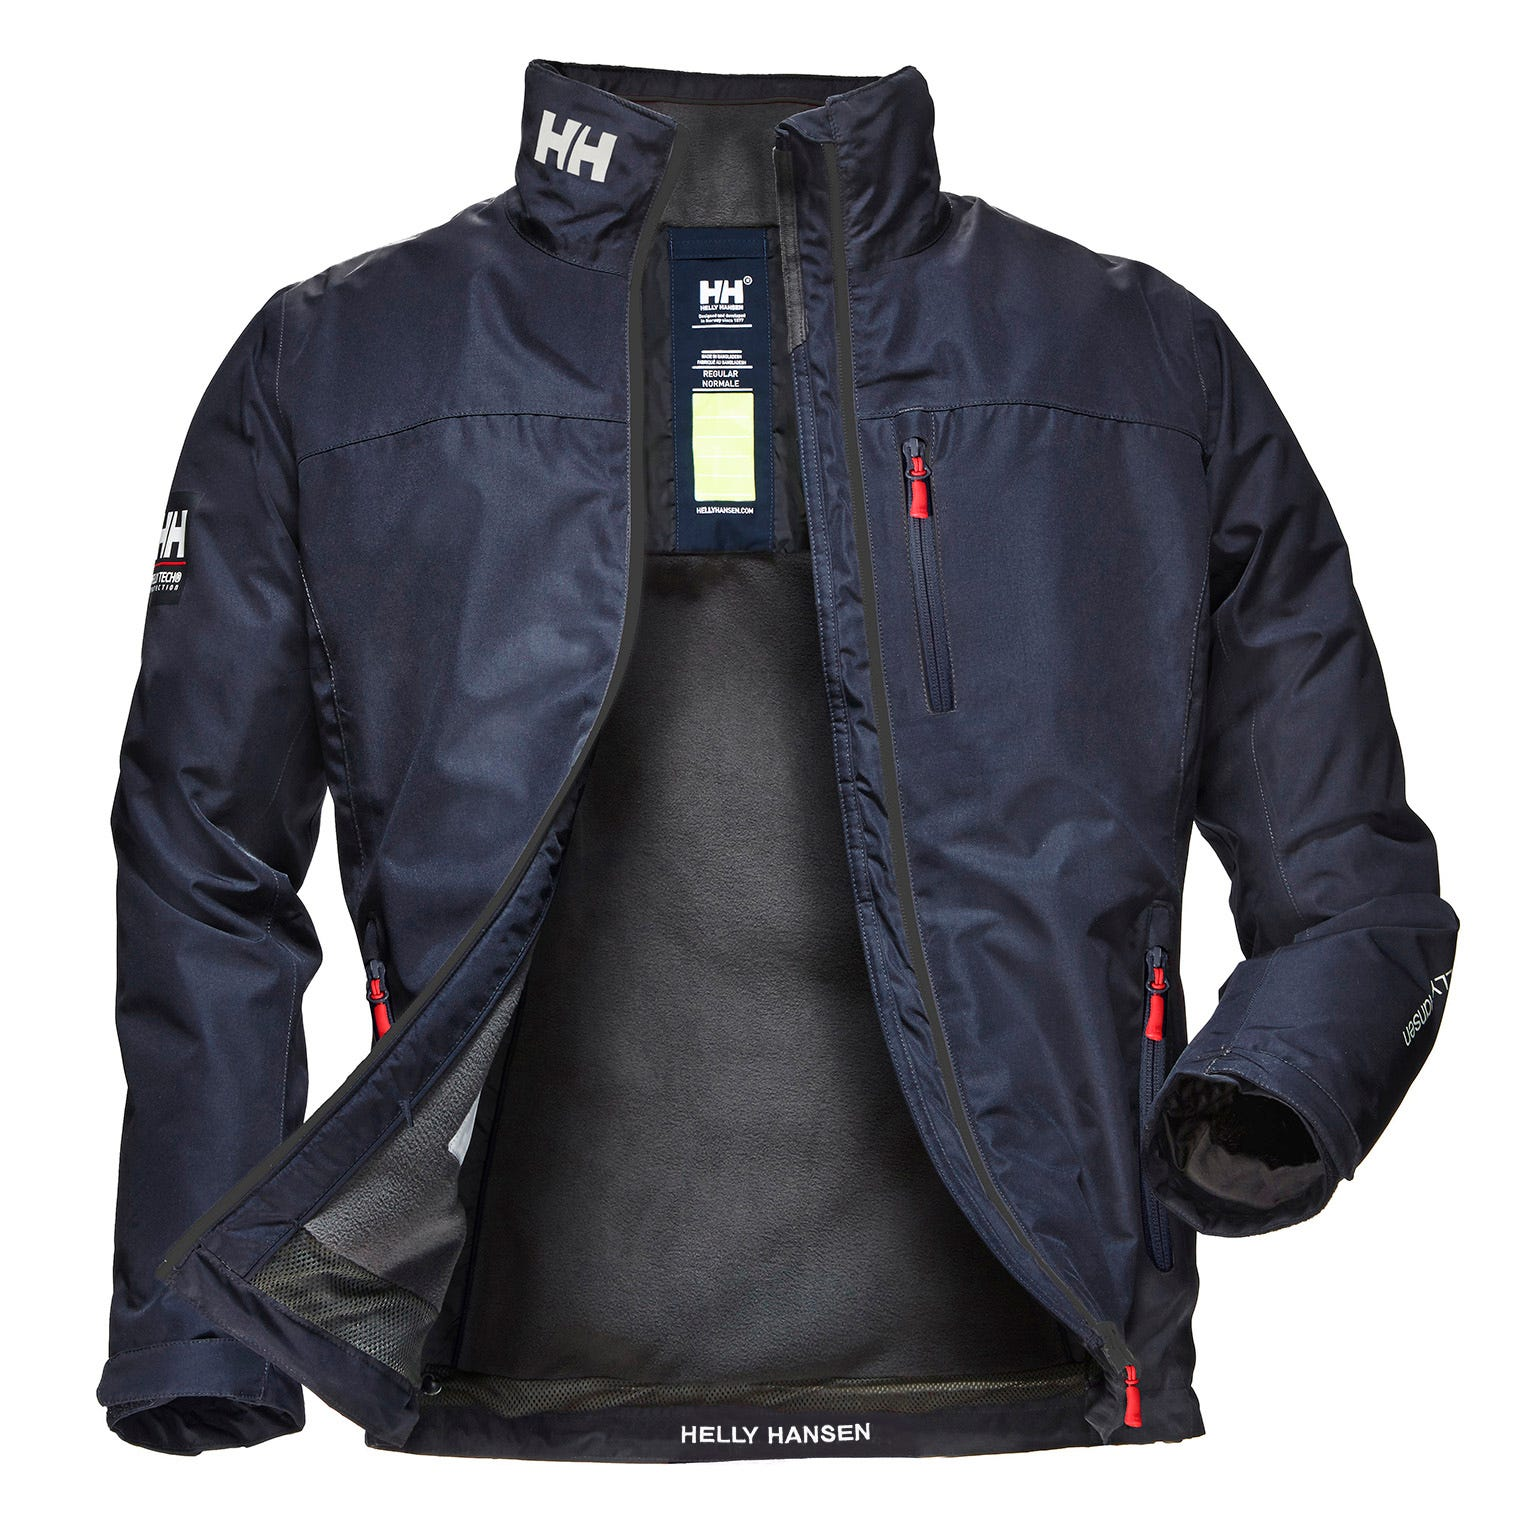 40617f2d07 Crew Midlayer Jacket   Waterproof Sailing Jacket   HH US